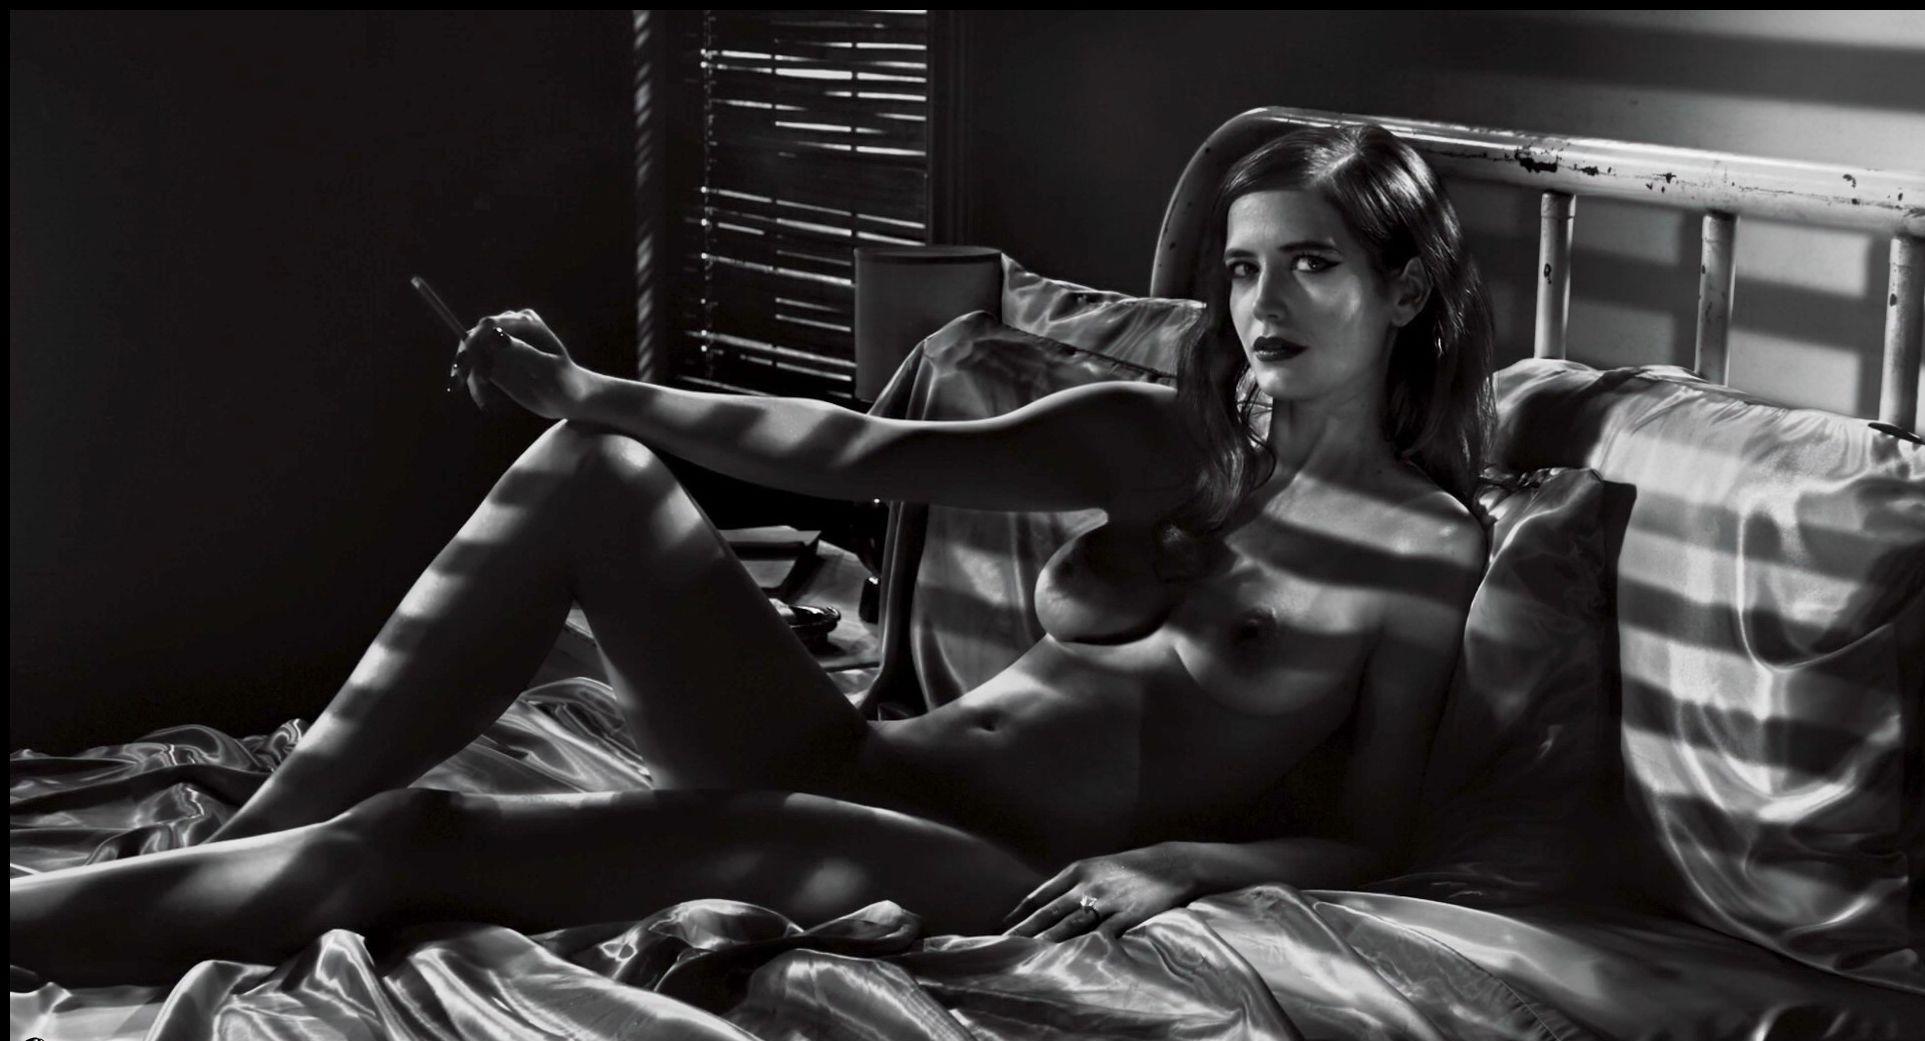 Eva green nude topless, pussy pics sex scenes